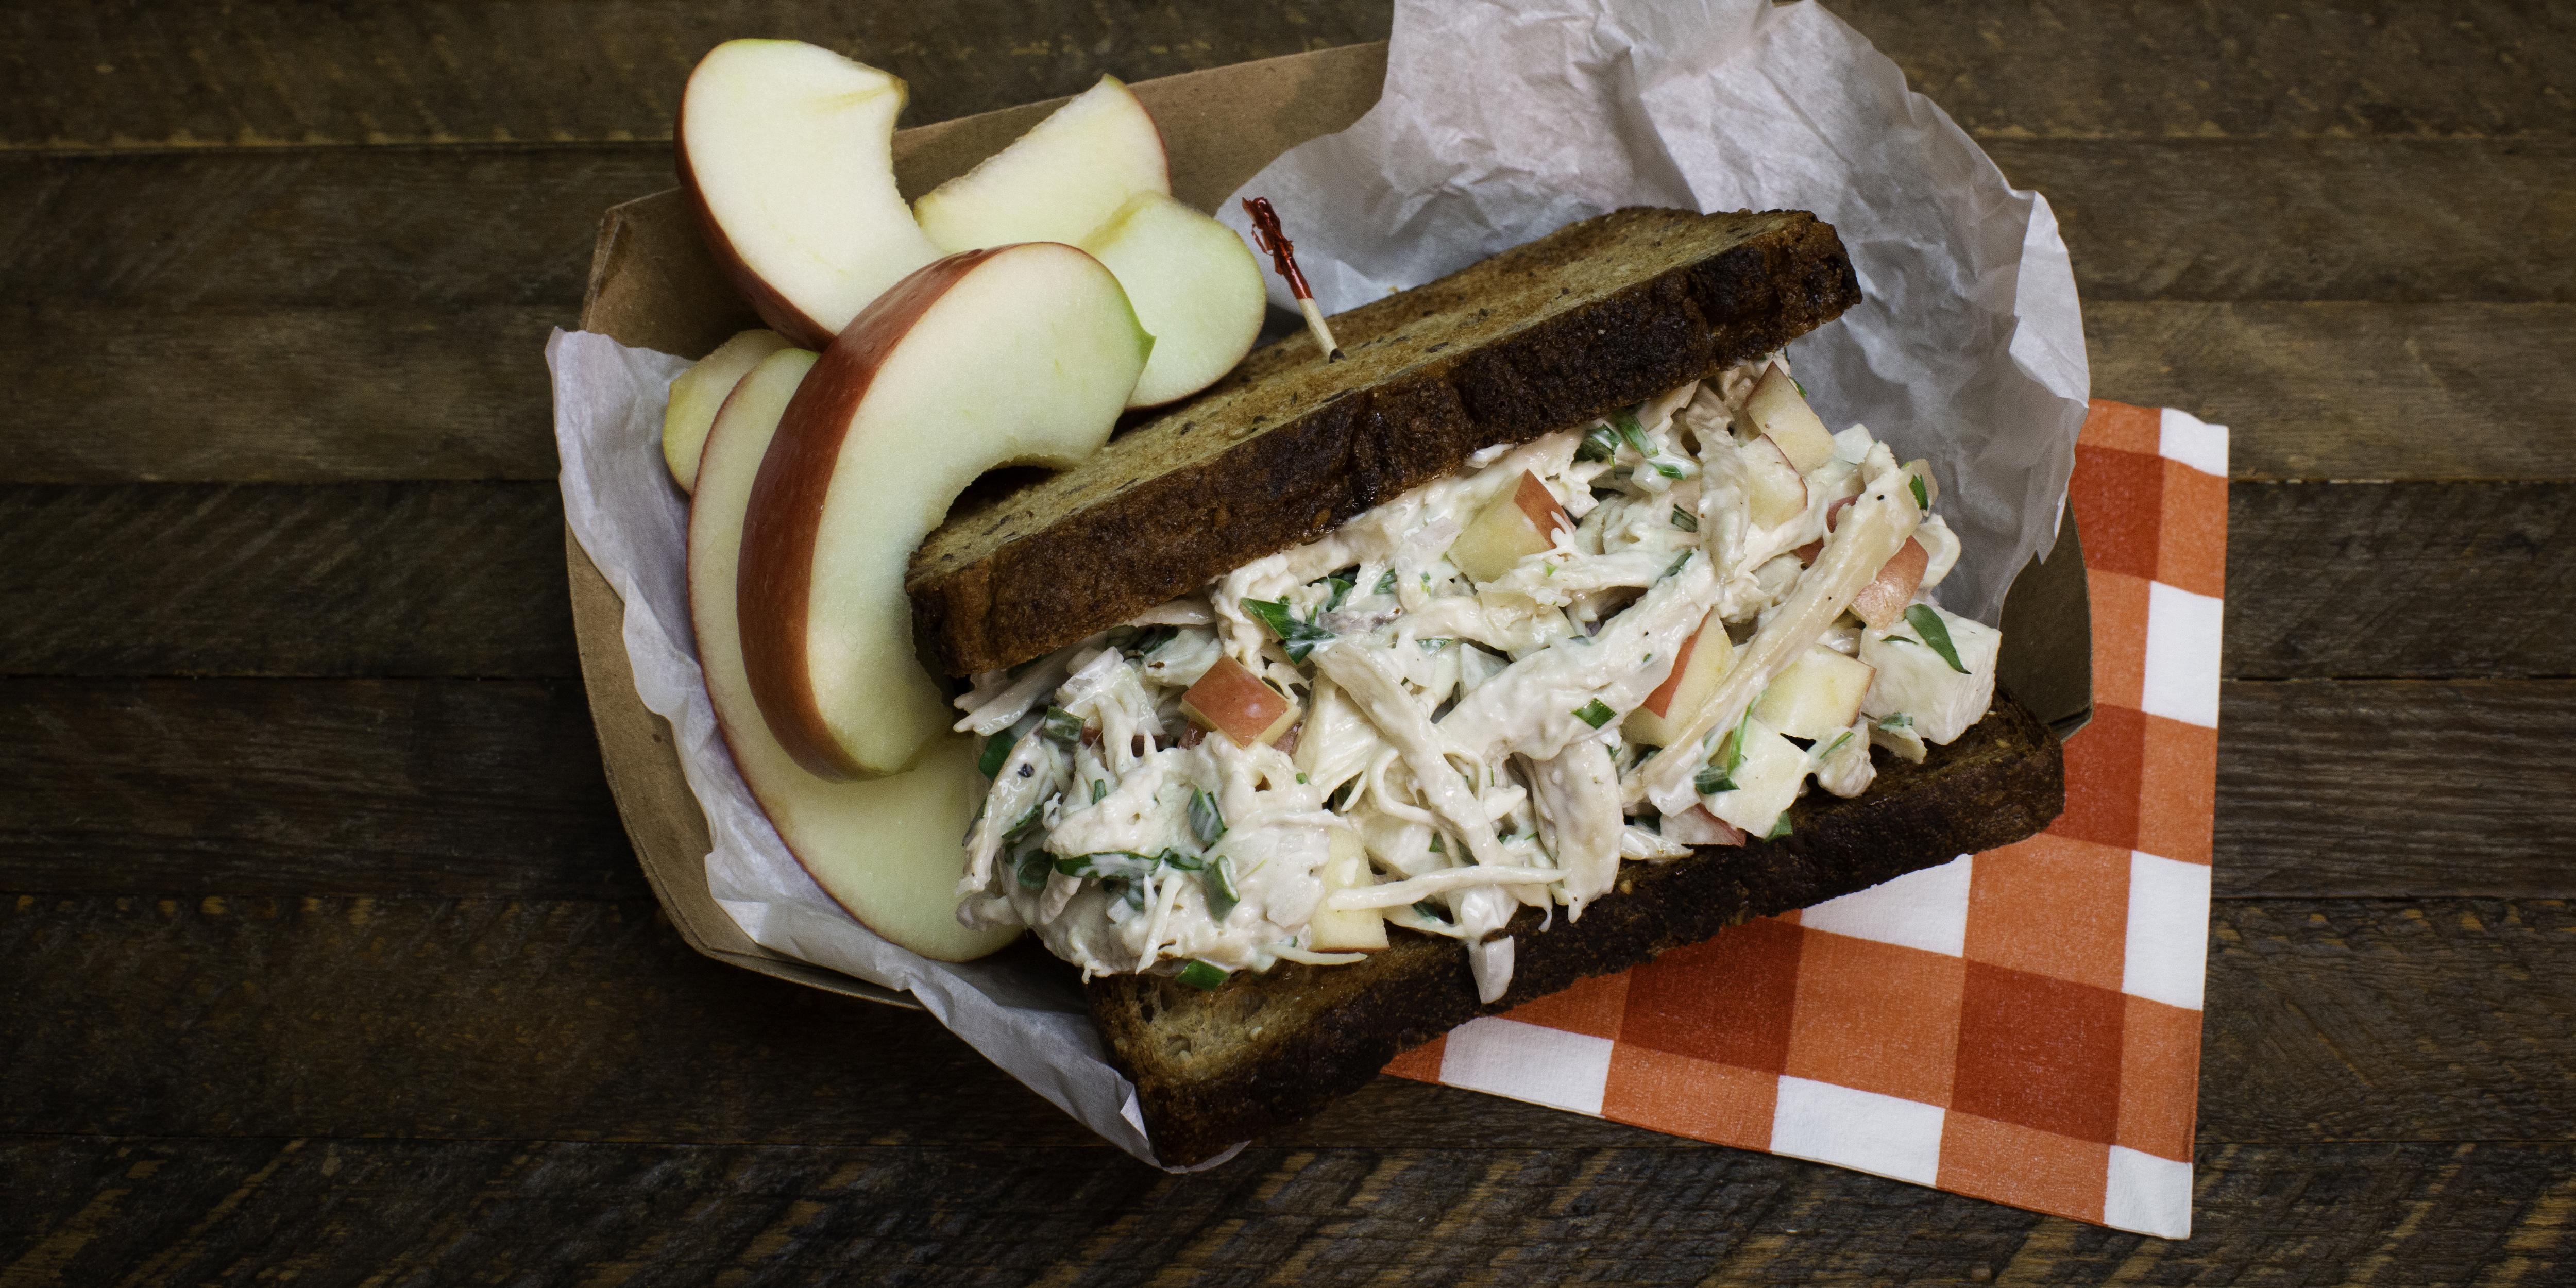 Joy Bauer adds fresh flavor and healthy mix-ins to chicken salad sandwiches